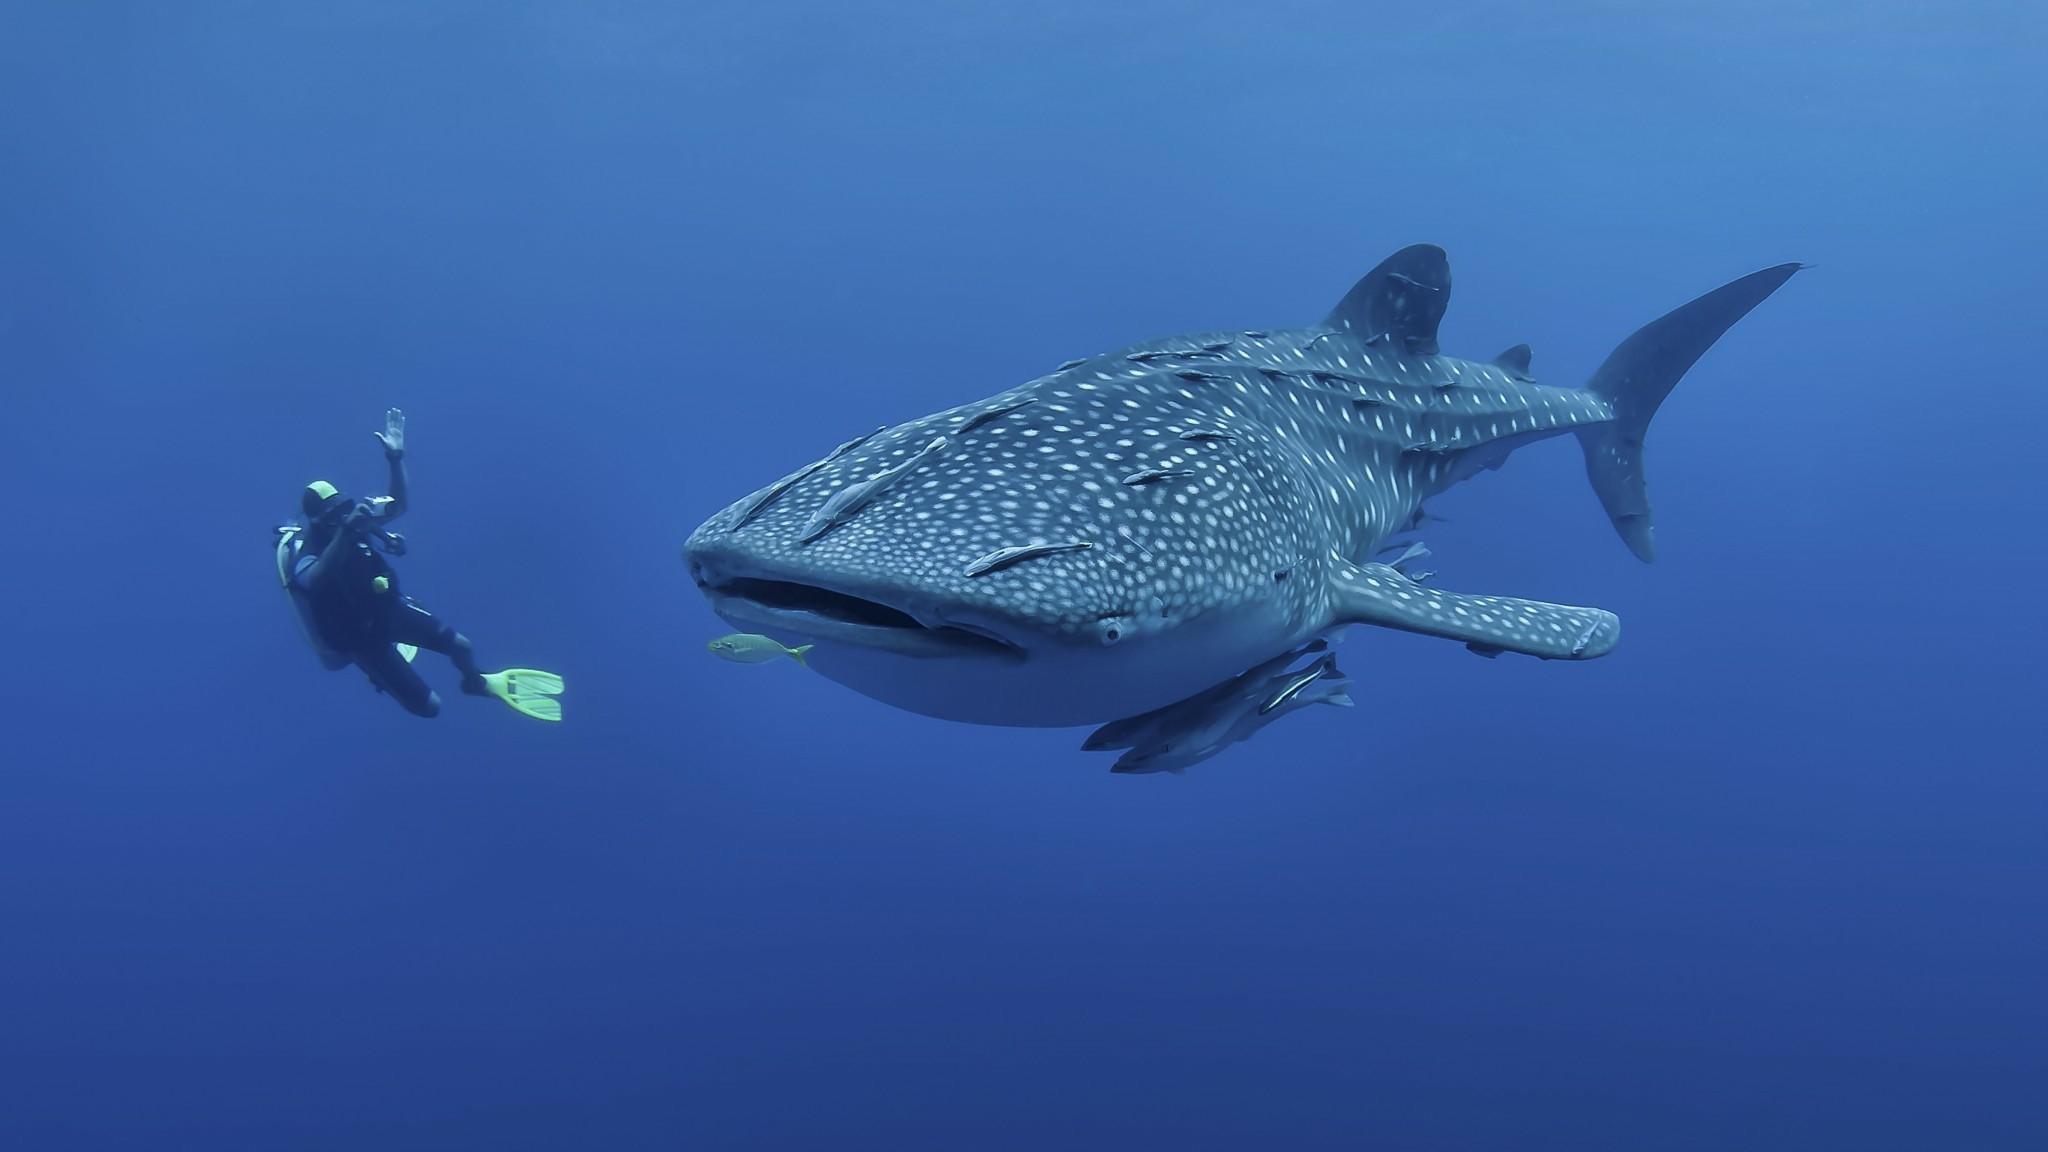 Hiu paus di Teluk Bintuni. (dok. asiatoday)